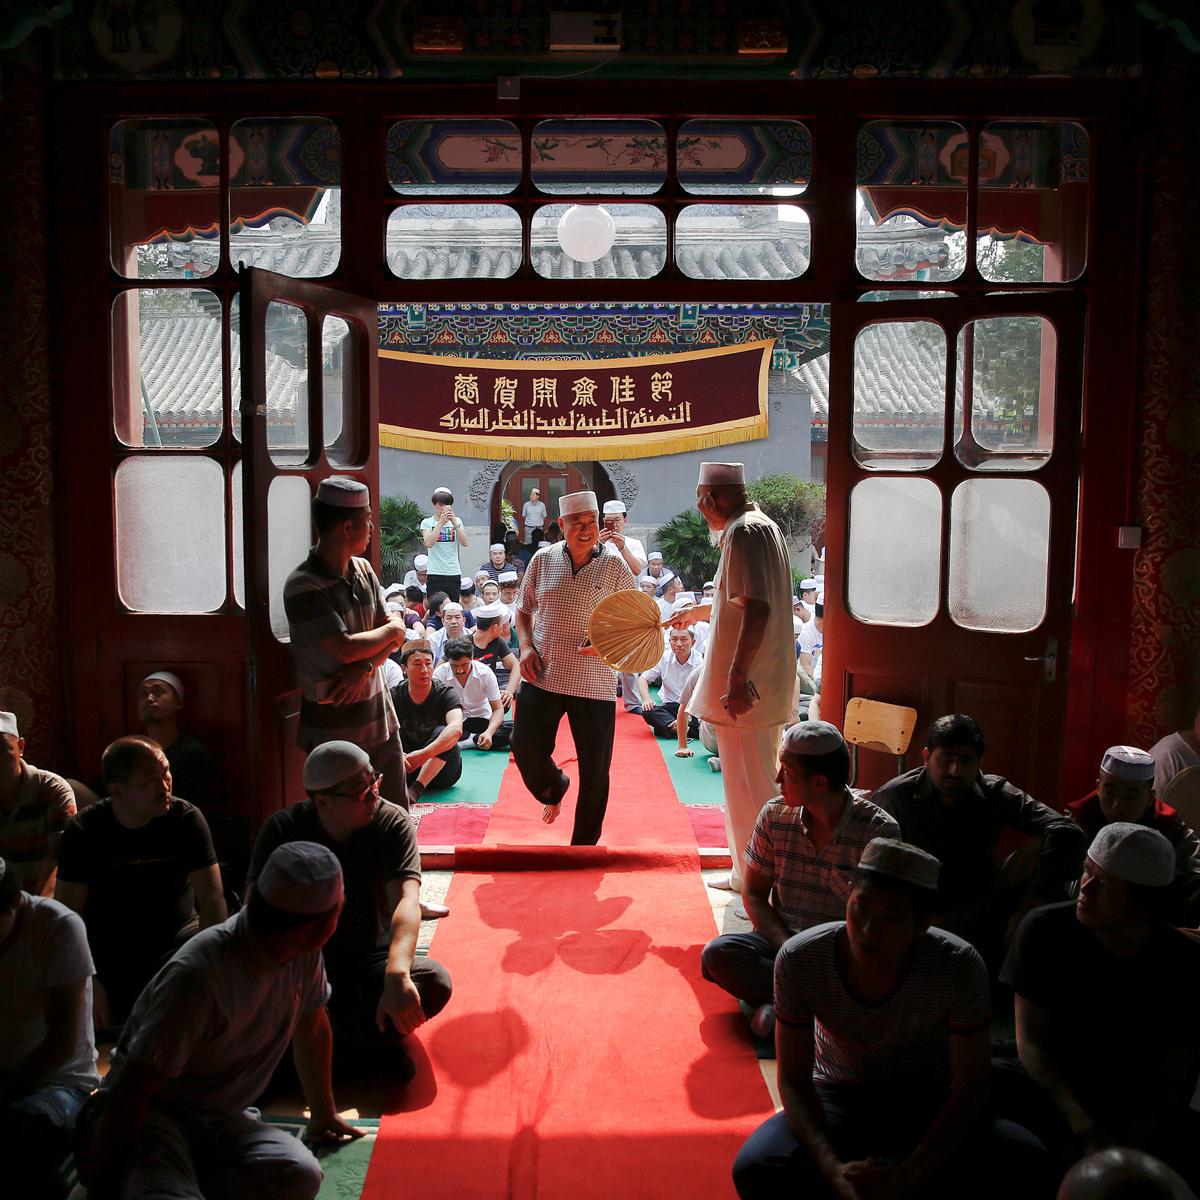 Most Inspiring China Eid Al-Fitr Feast - e6e5eda799f24f798d9240c168177d54_8  Collection_706618 .jpg